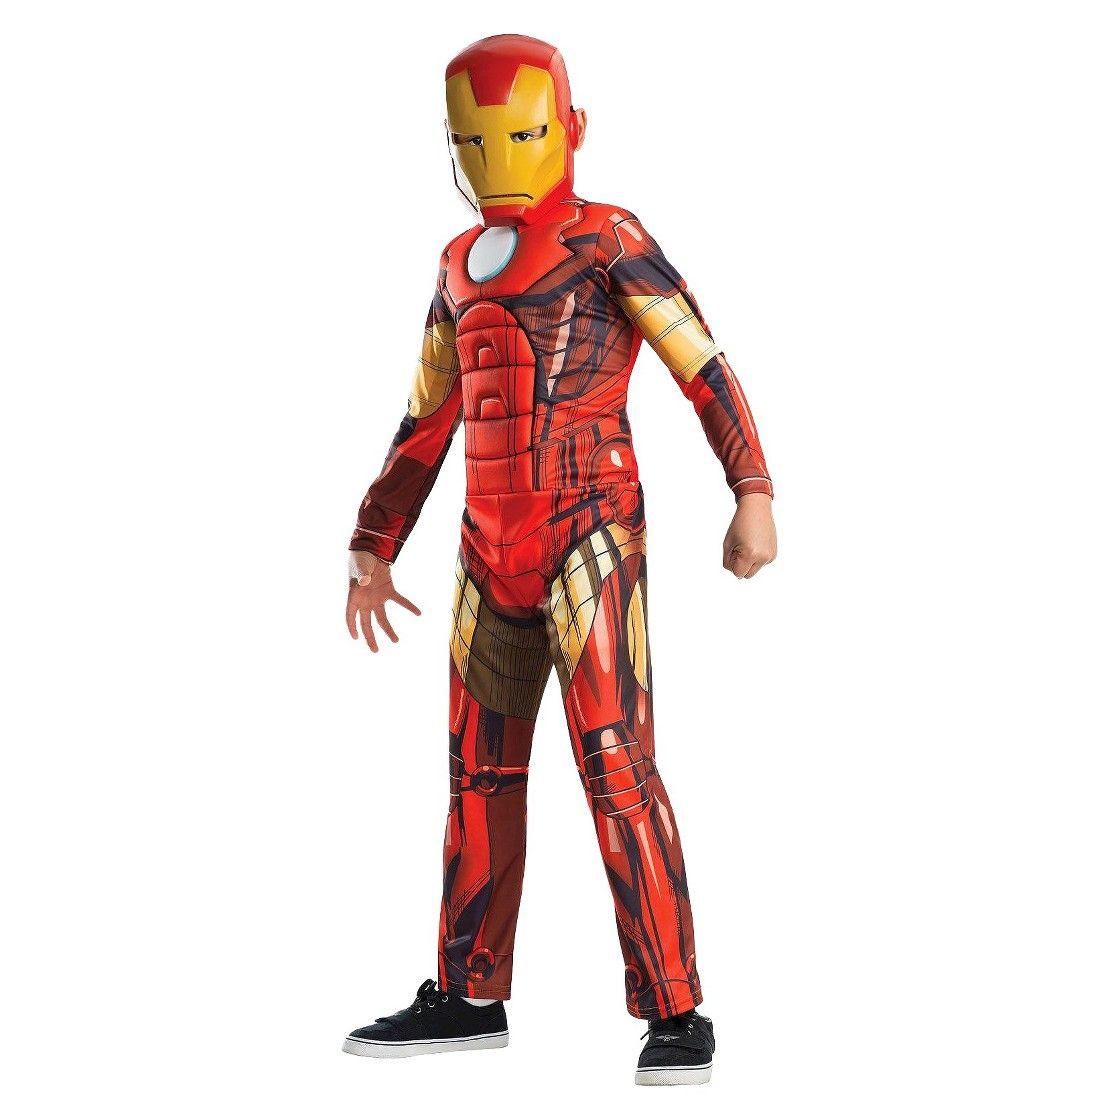 Avengers Assemble Childrens Costume Deluxe Iron Man